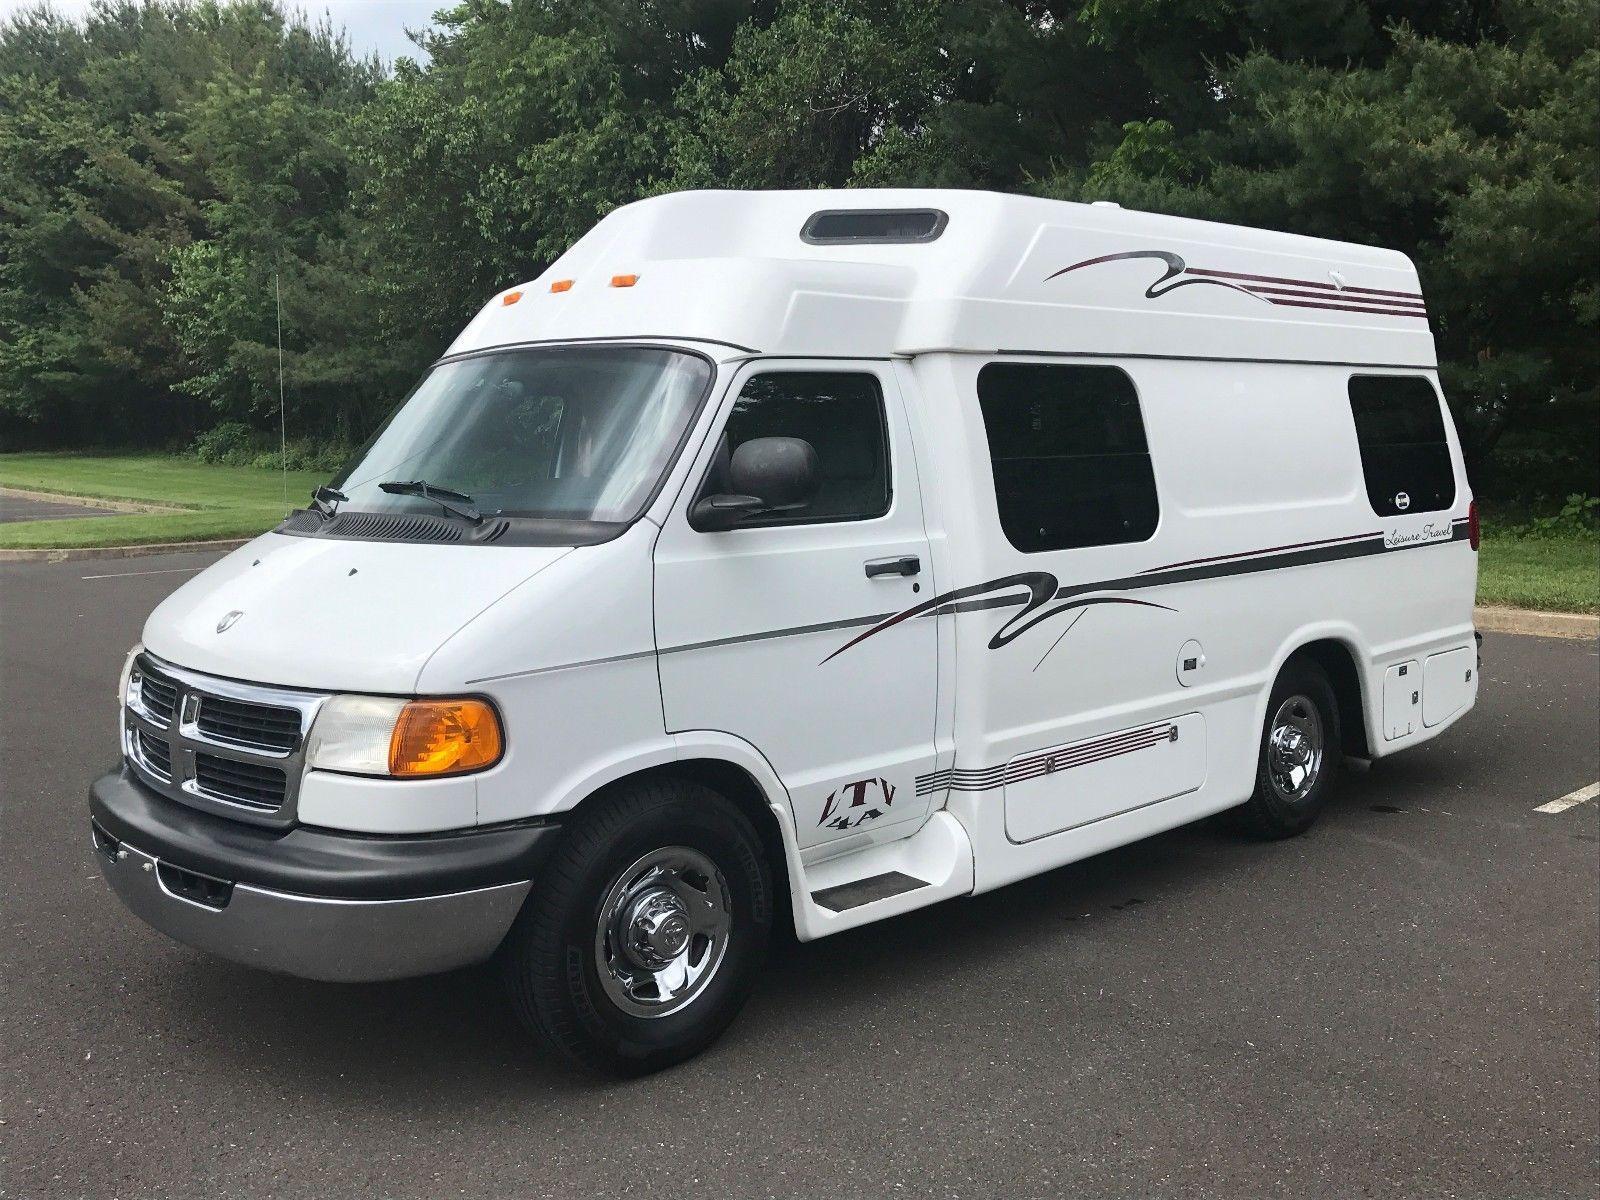 2000 Dodge Ram 3500 Leisure Travel Camper Wide Body Van Rv Class B